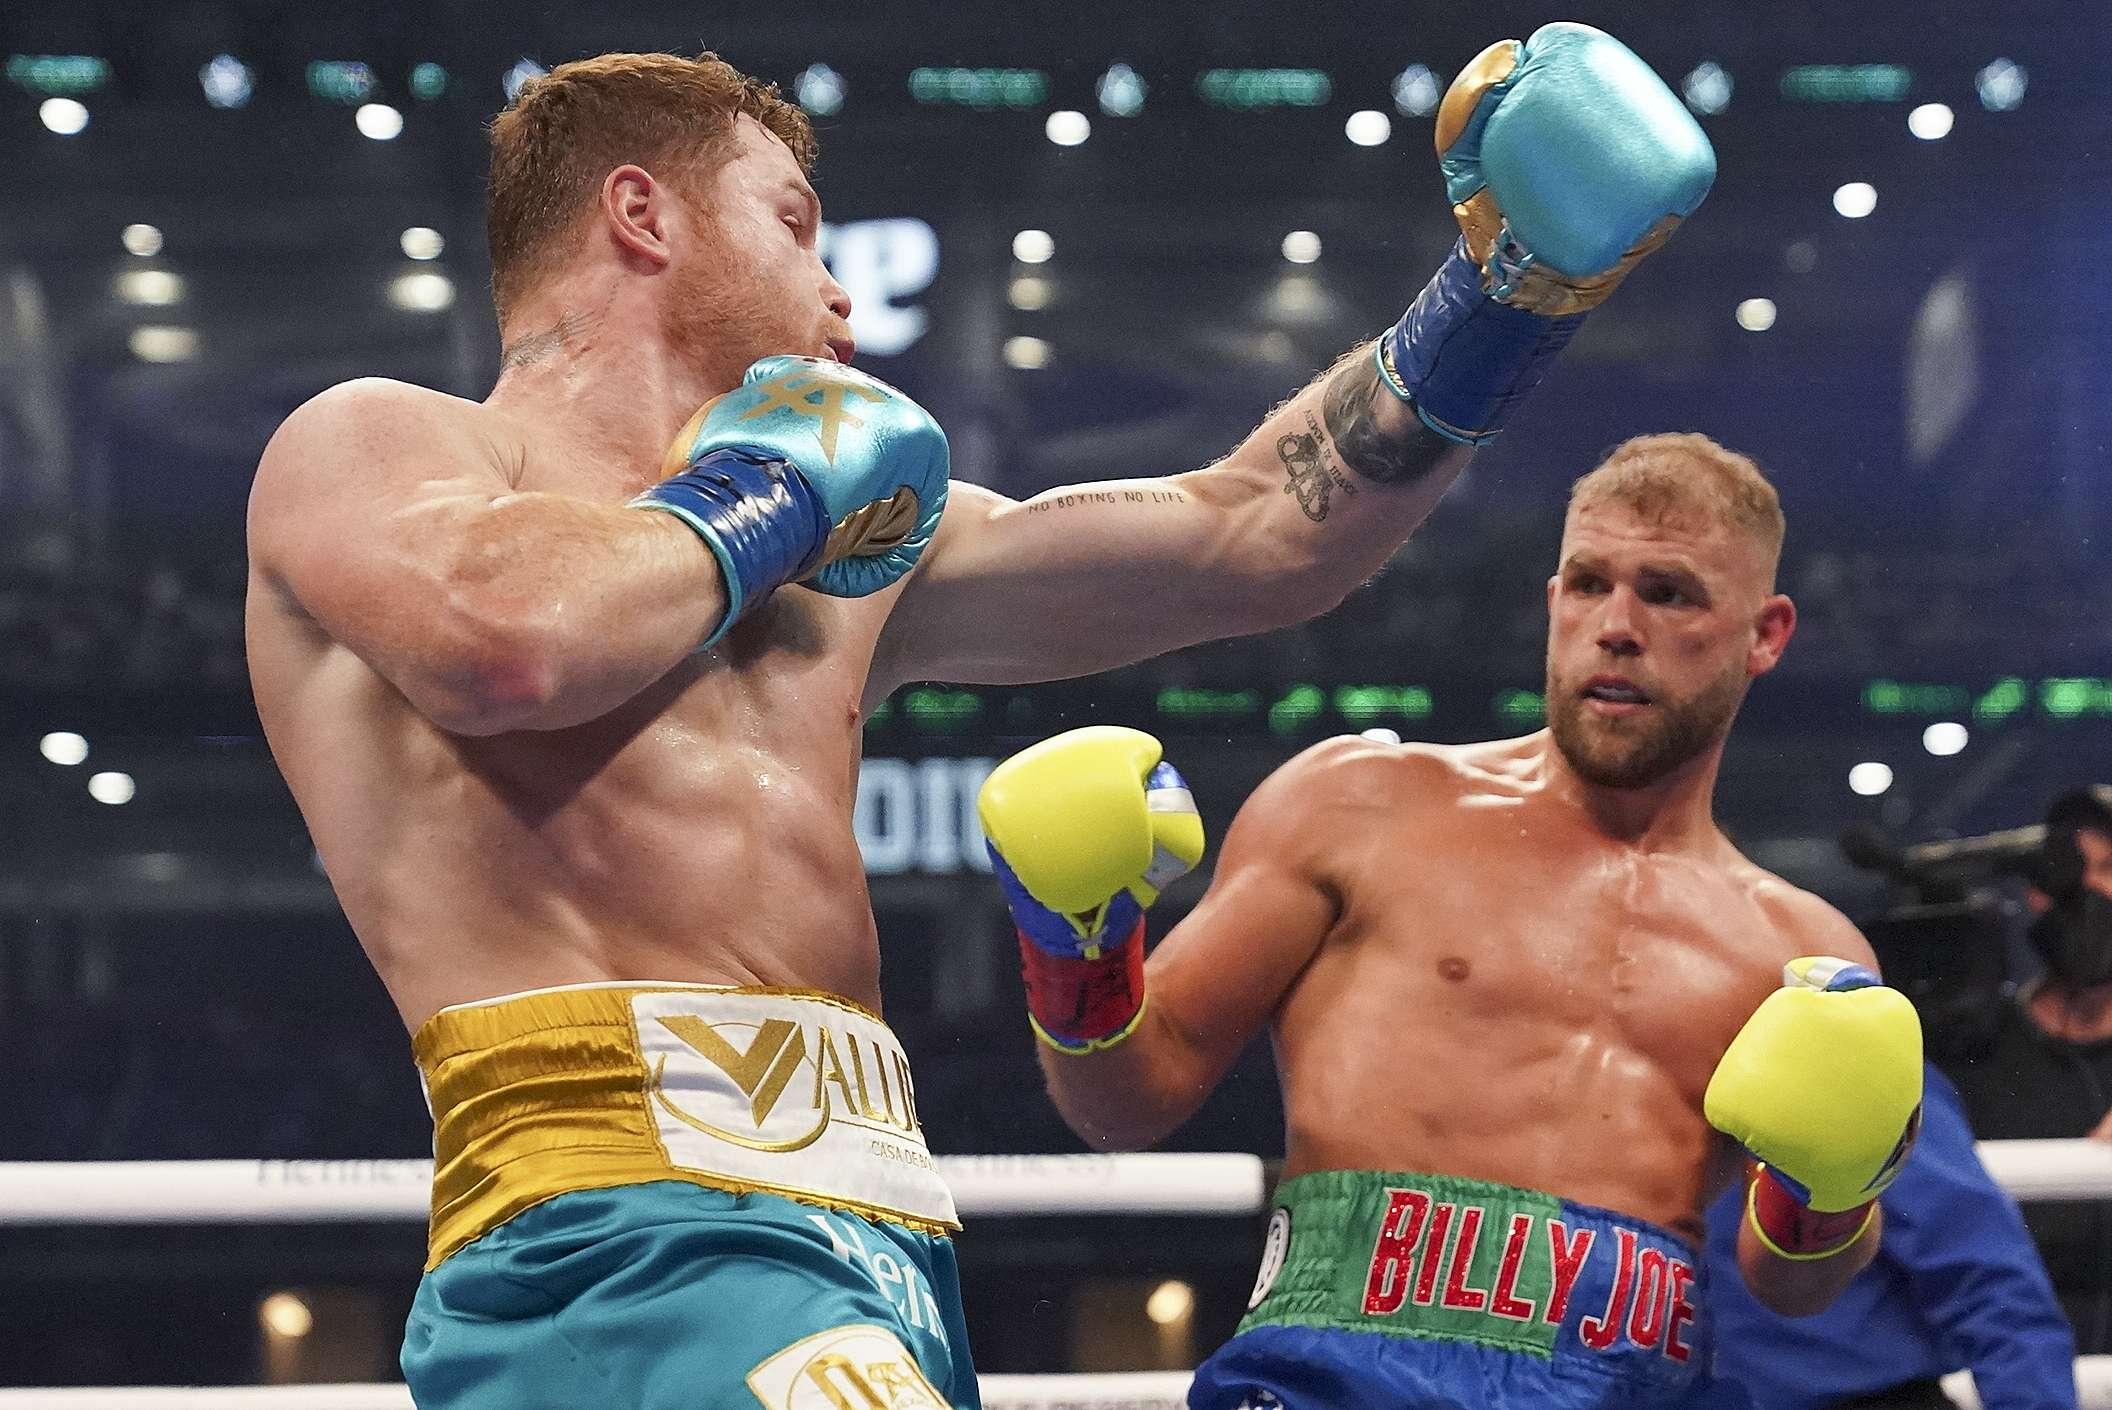 Se impone «El Canelo» Álvarez y derrota por KO técnico a Billy Joe Saunders